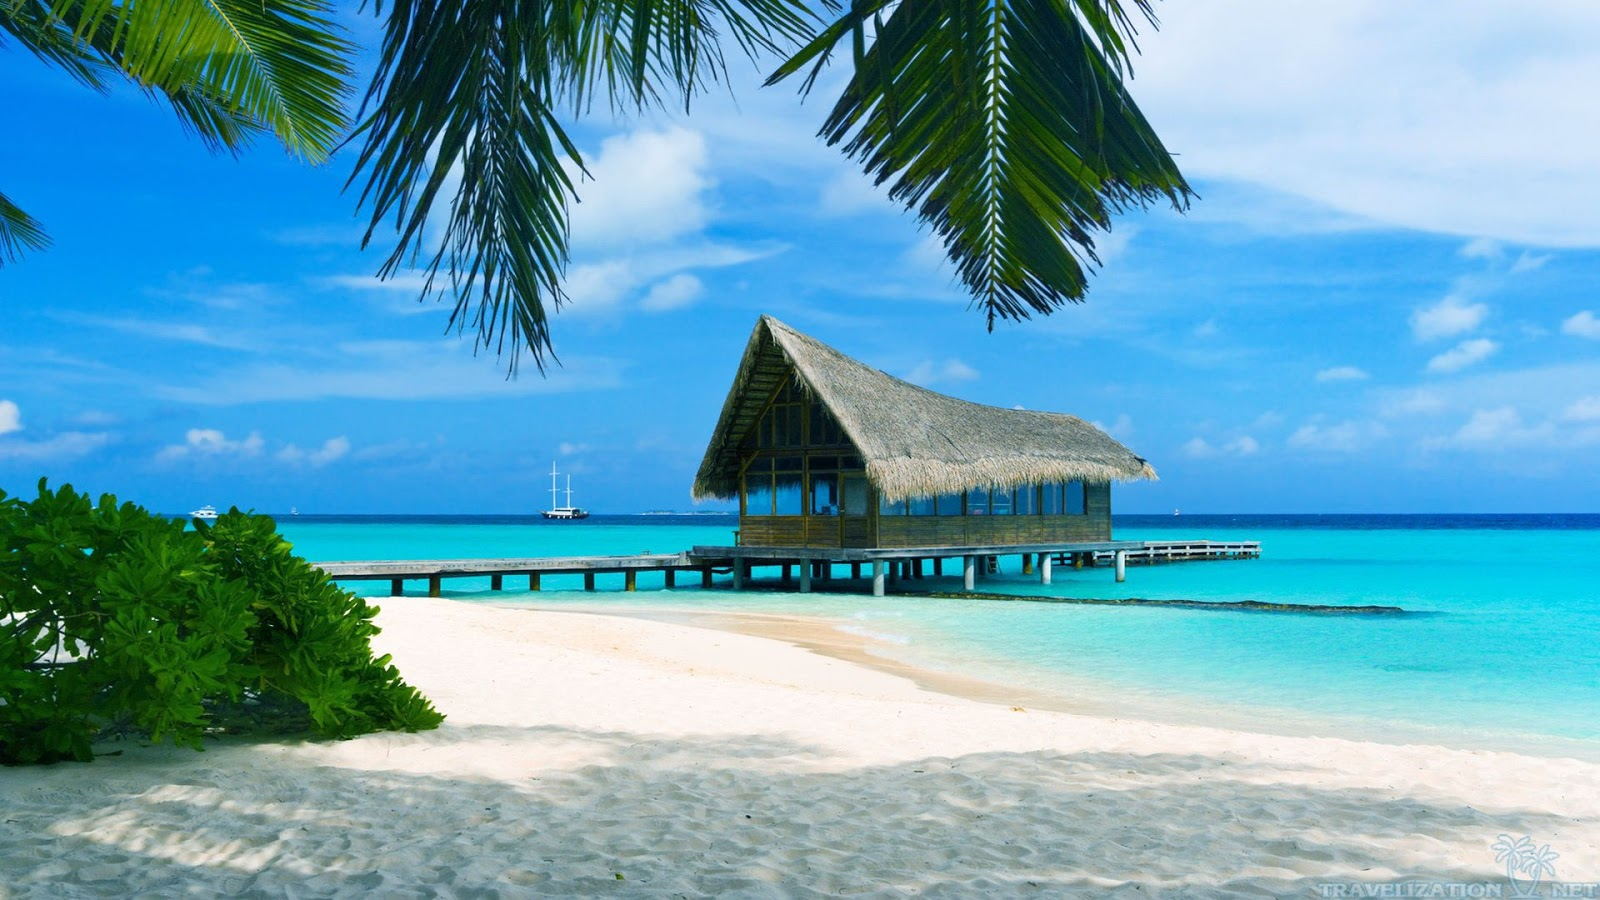 Vacation Inspirations